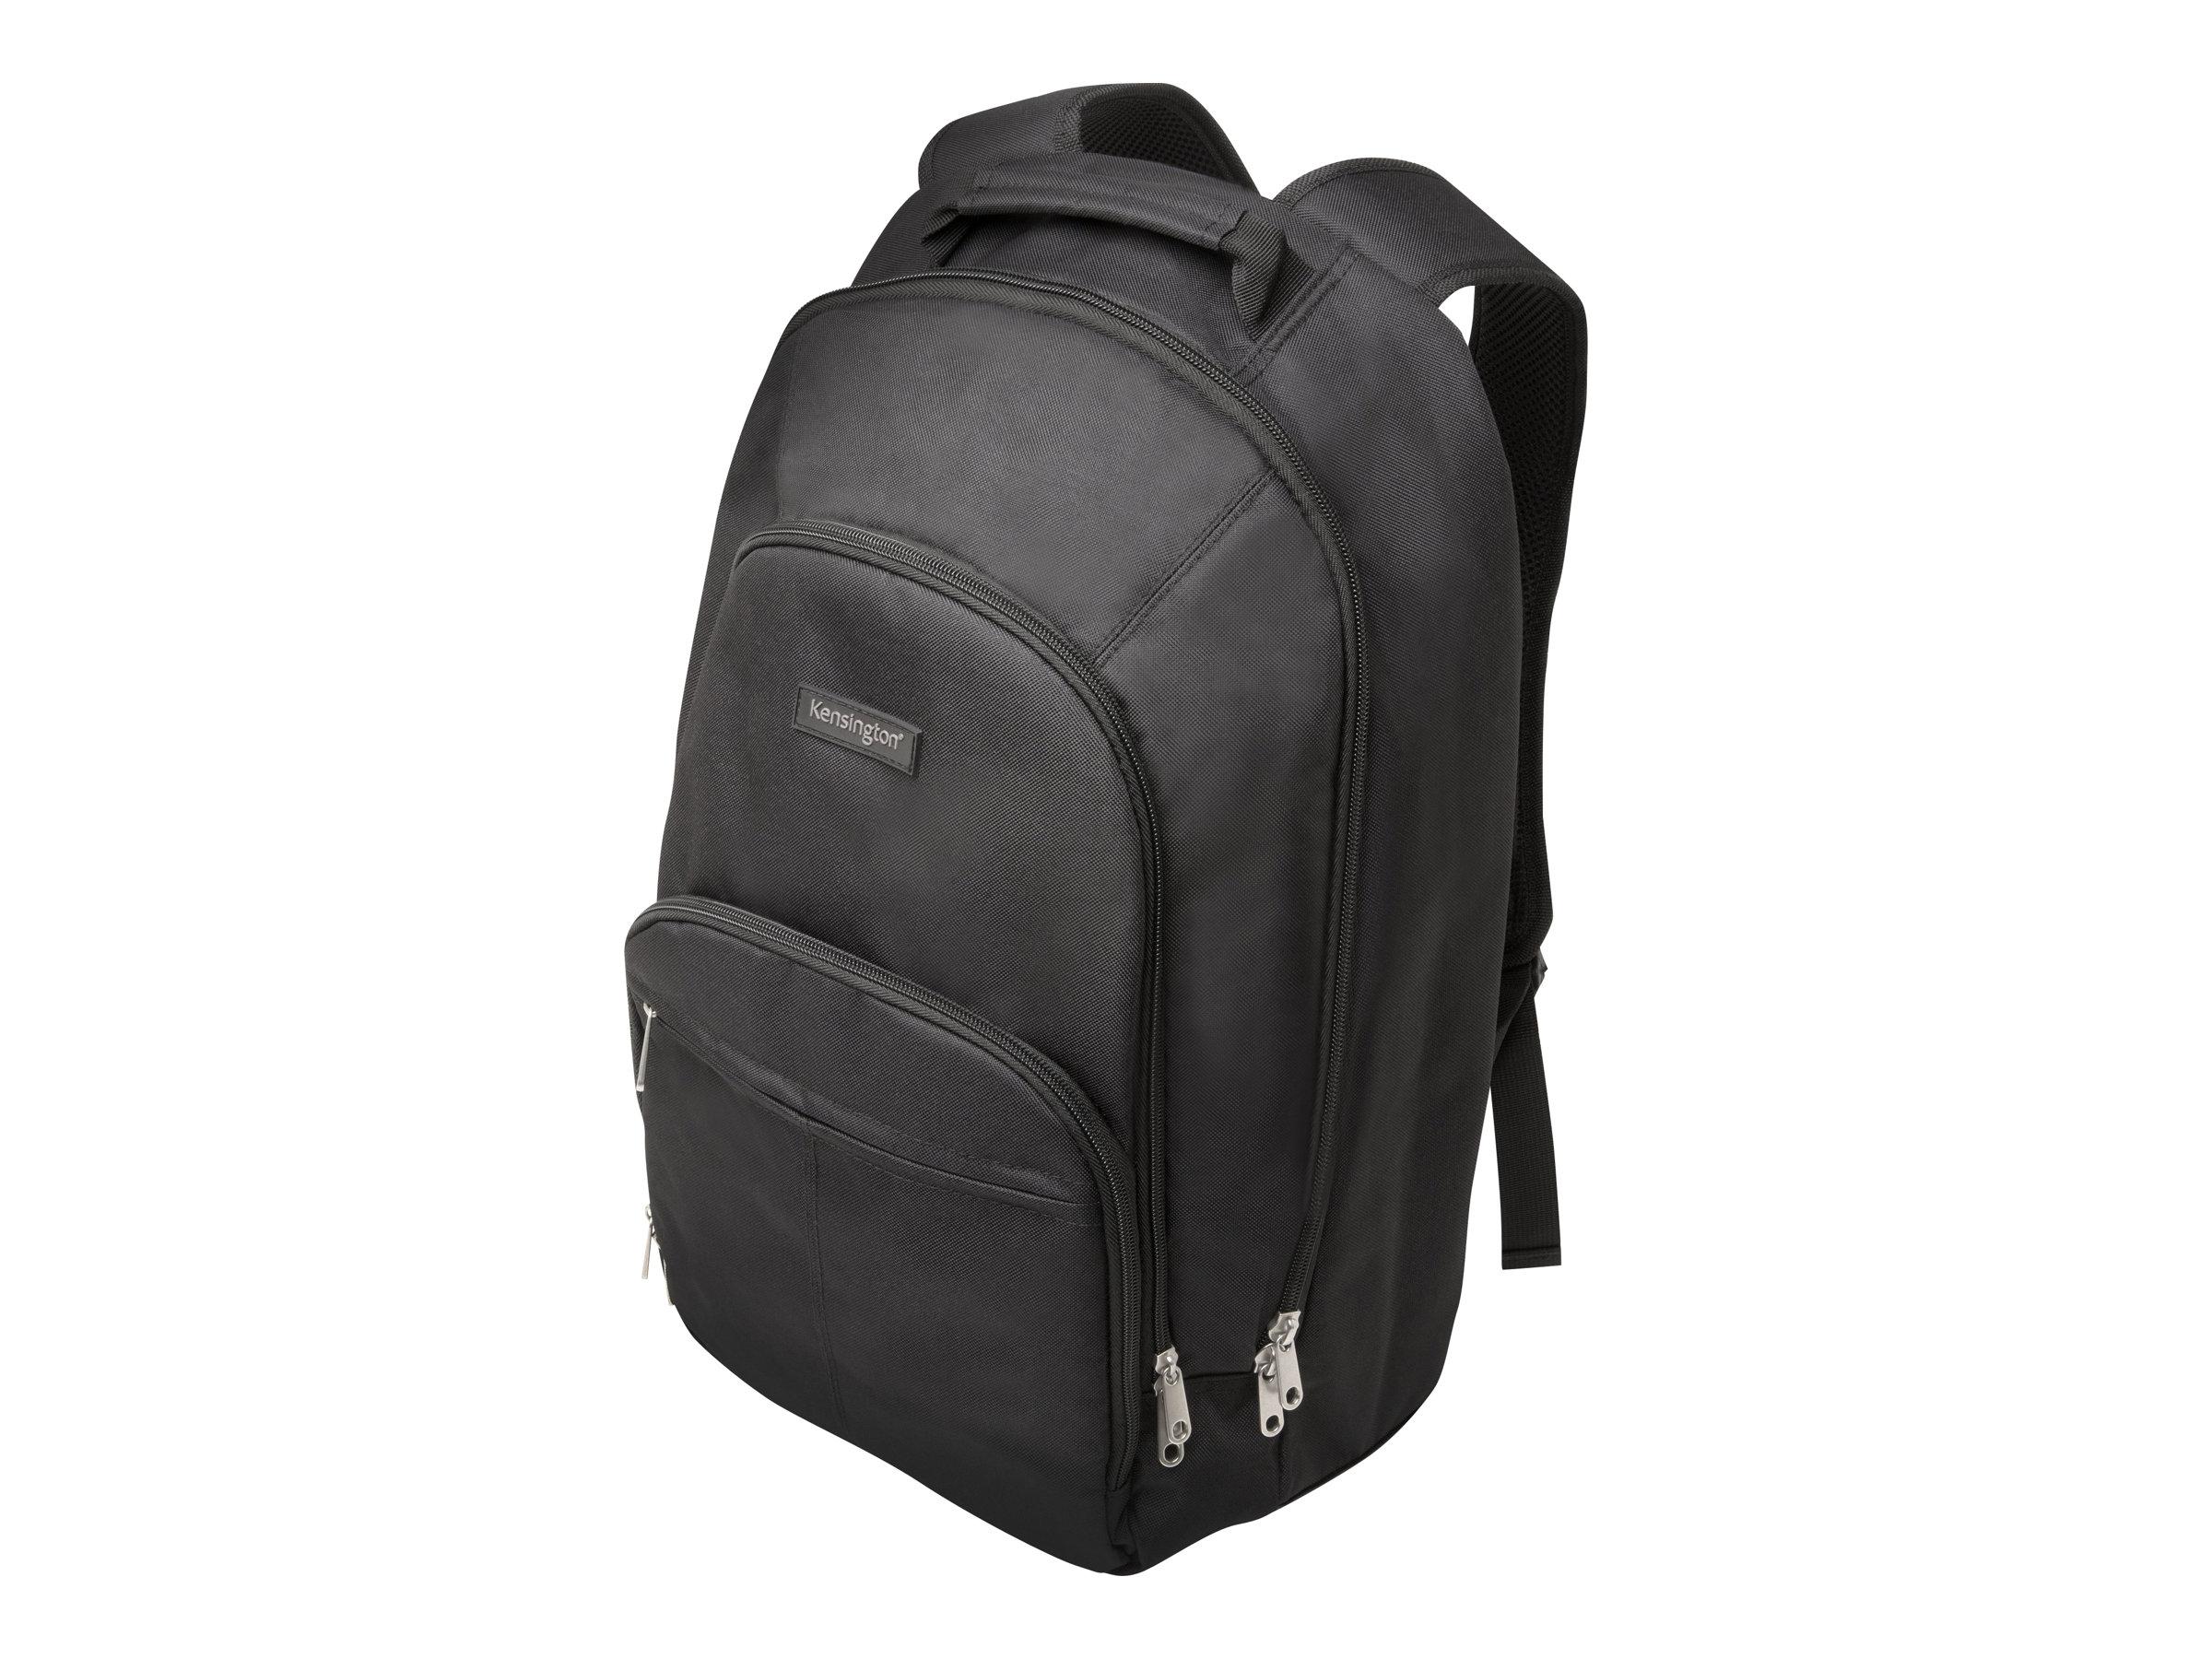 "Kensington SP25 15.4"" Classic Backpack - Notebook-Rucksack - 39.1 cm (15.4"")"